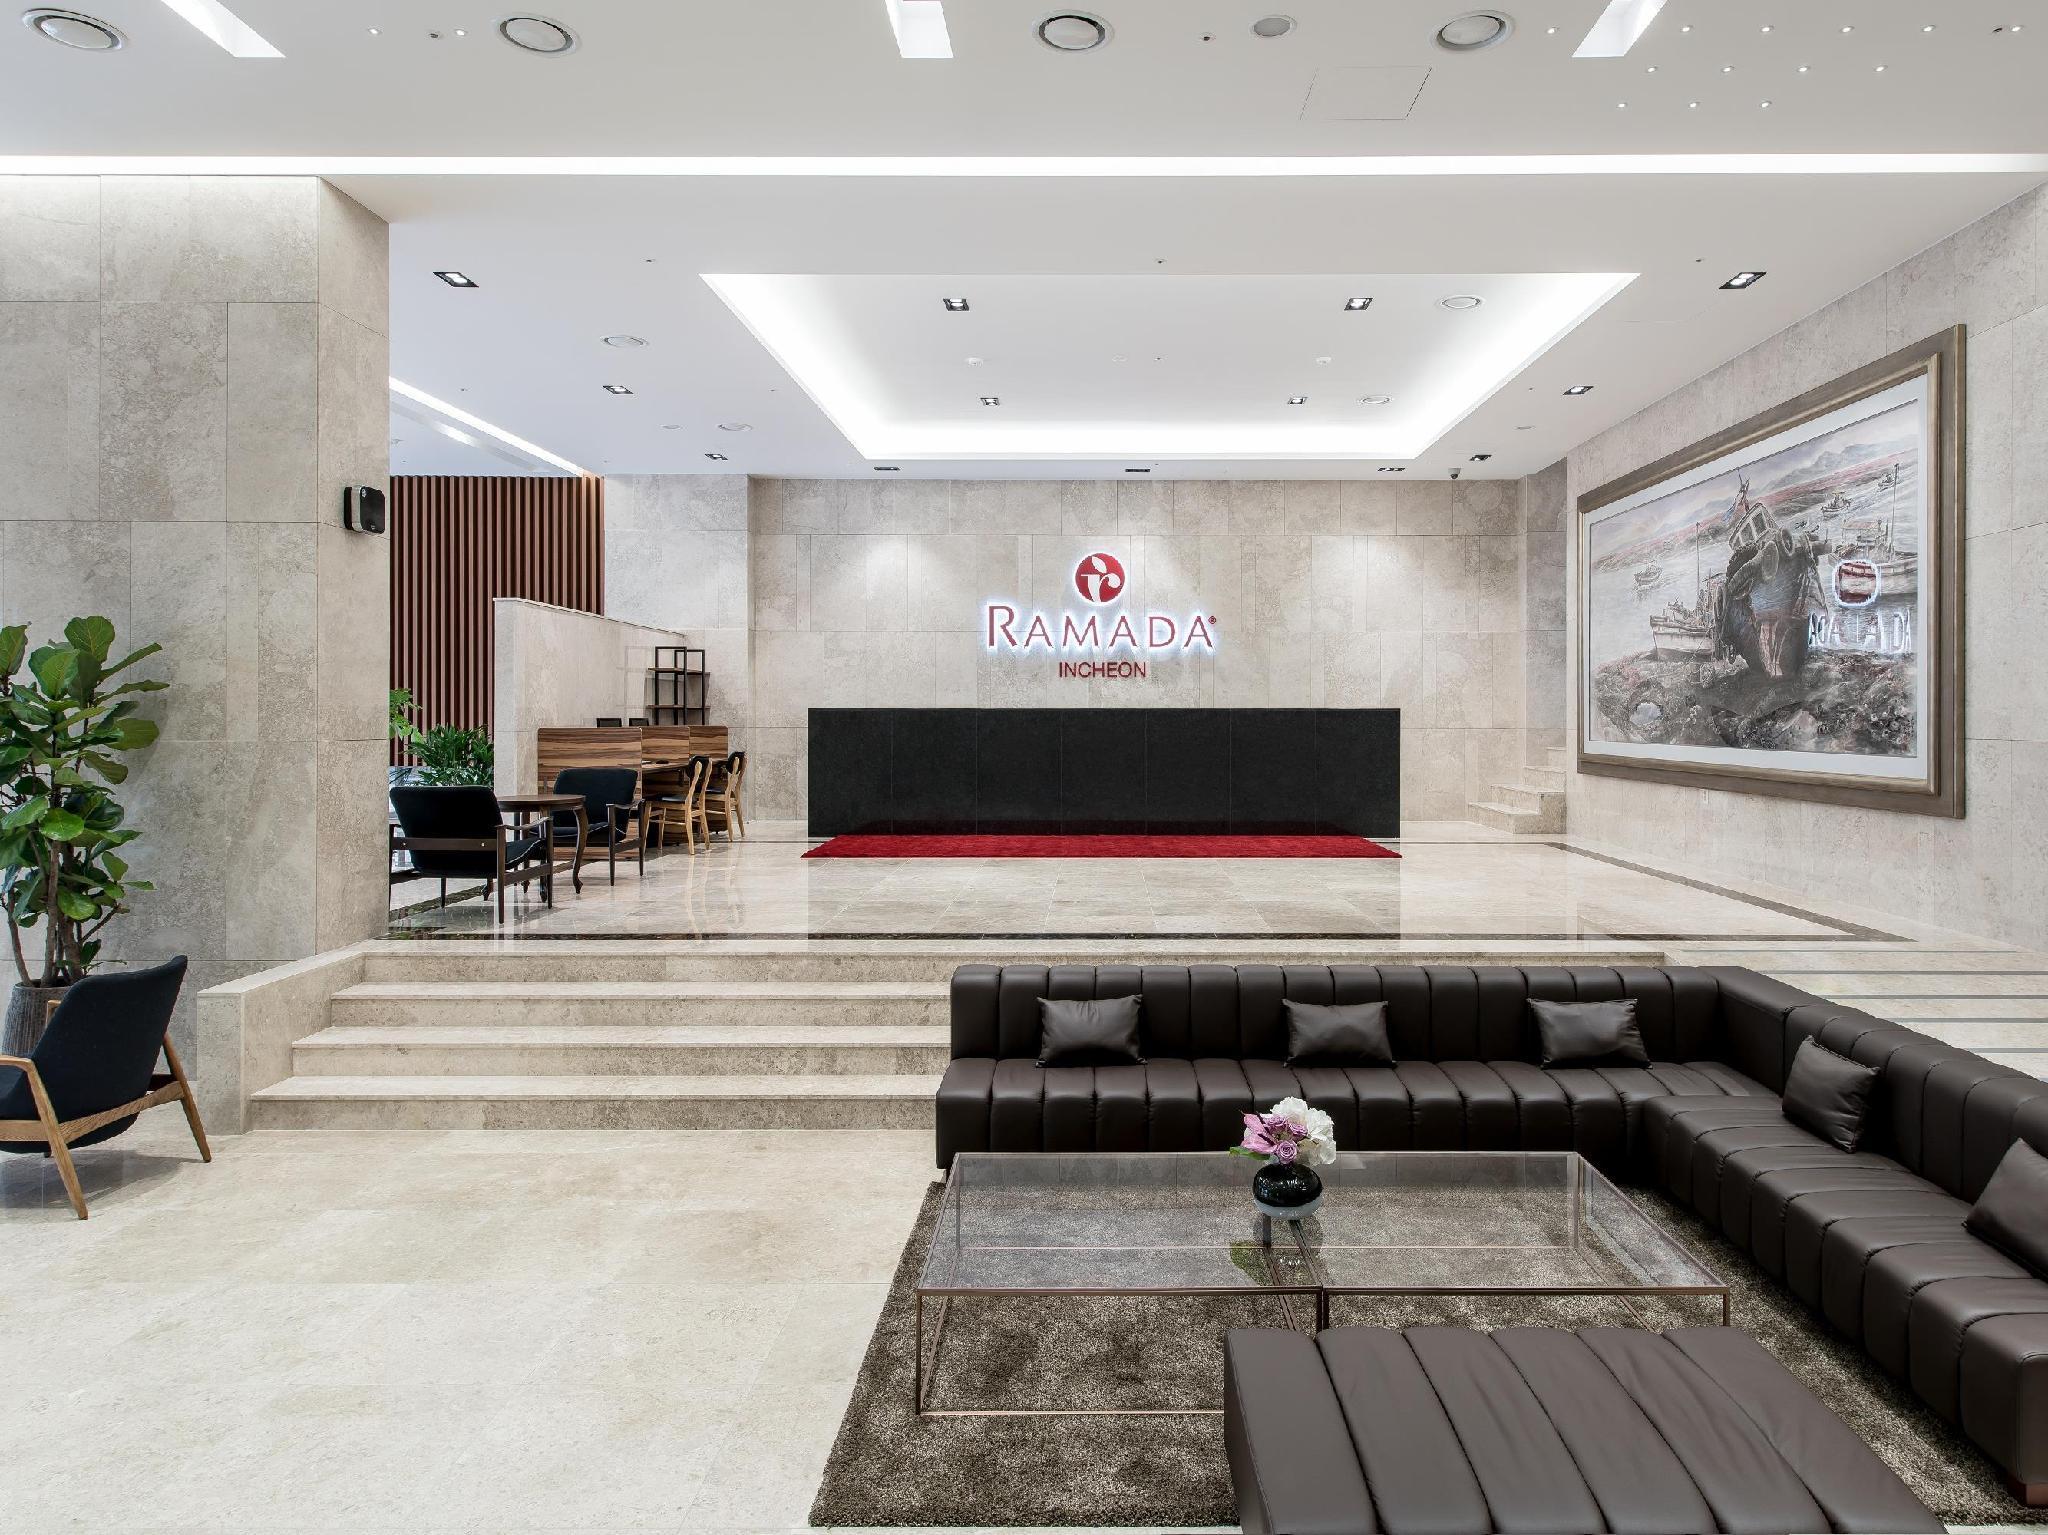 Ramada Incheon Hotel Booking Agoda Com Best Price Guarantee